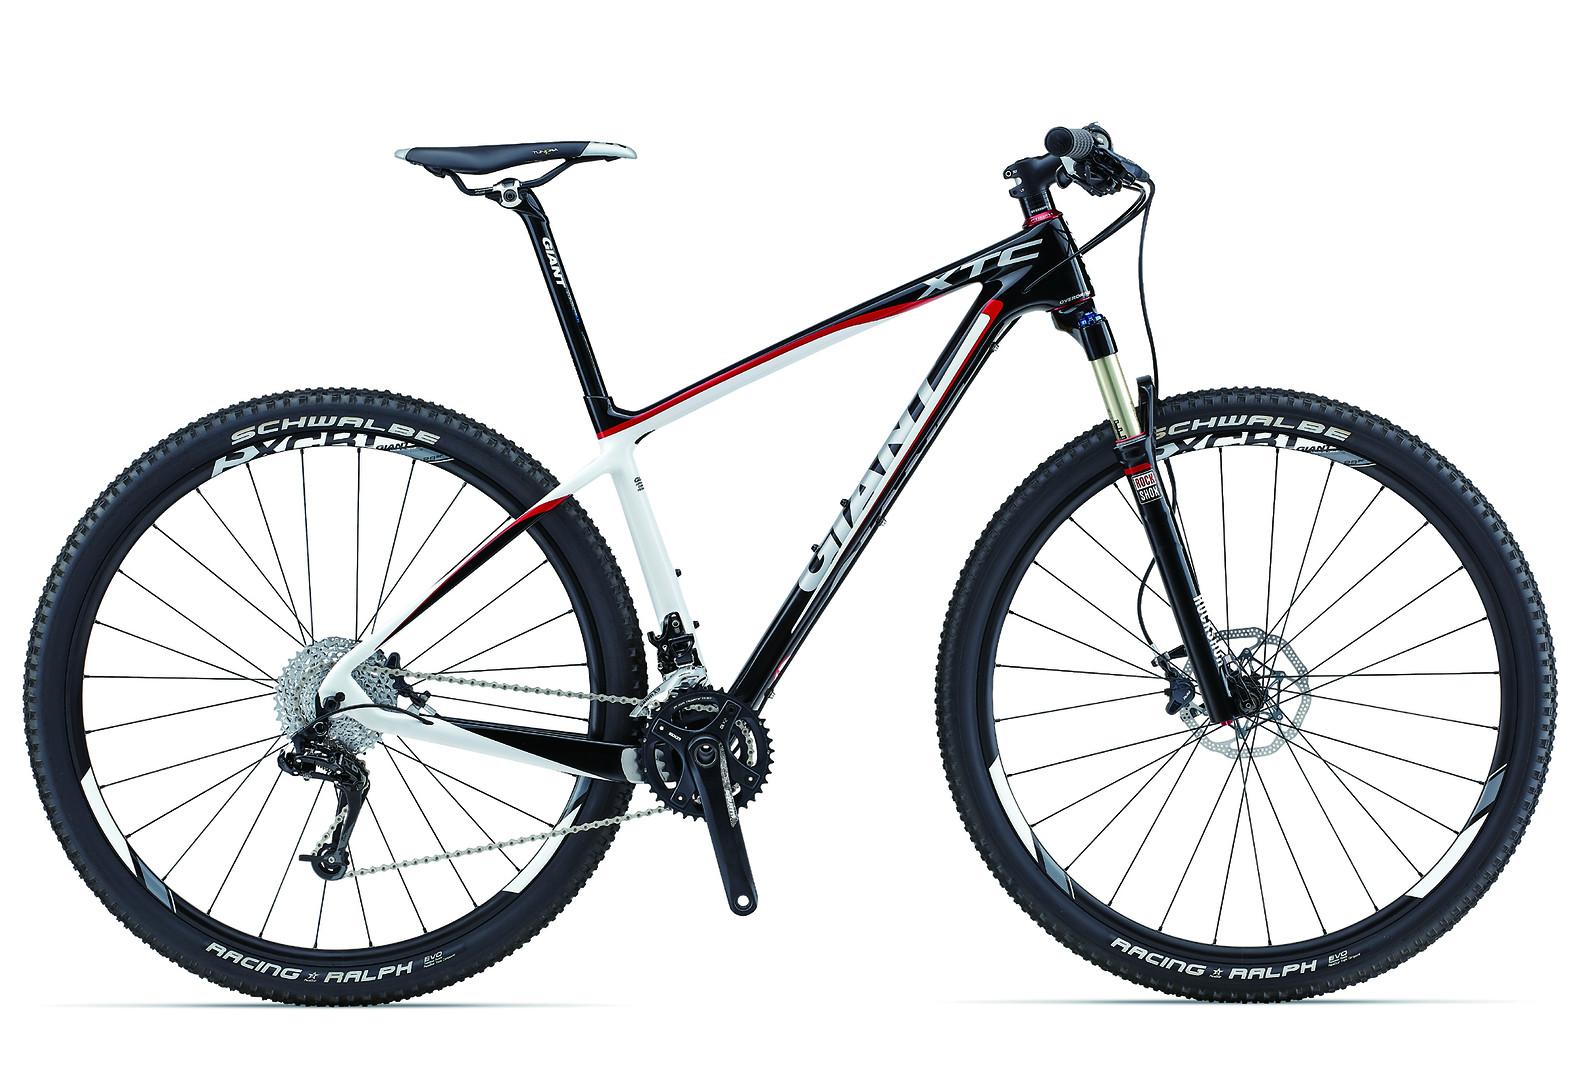 2013 Giant XTC Advanced SL 29er 1 Bike XtC_Advanced_SL_29er_1